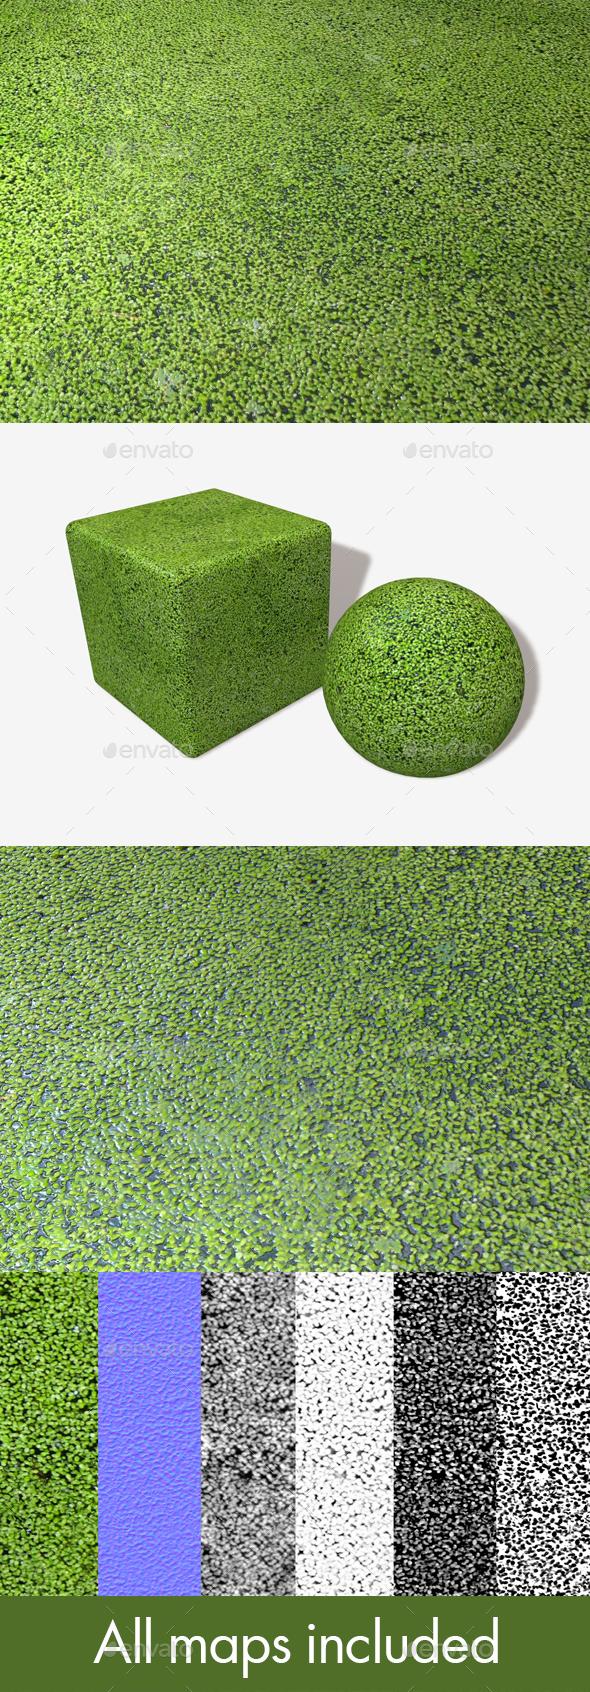 3DOcean Pond Weeds Seamless Texture 19783188